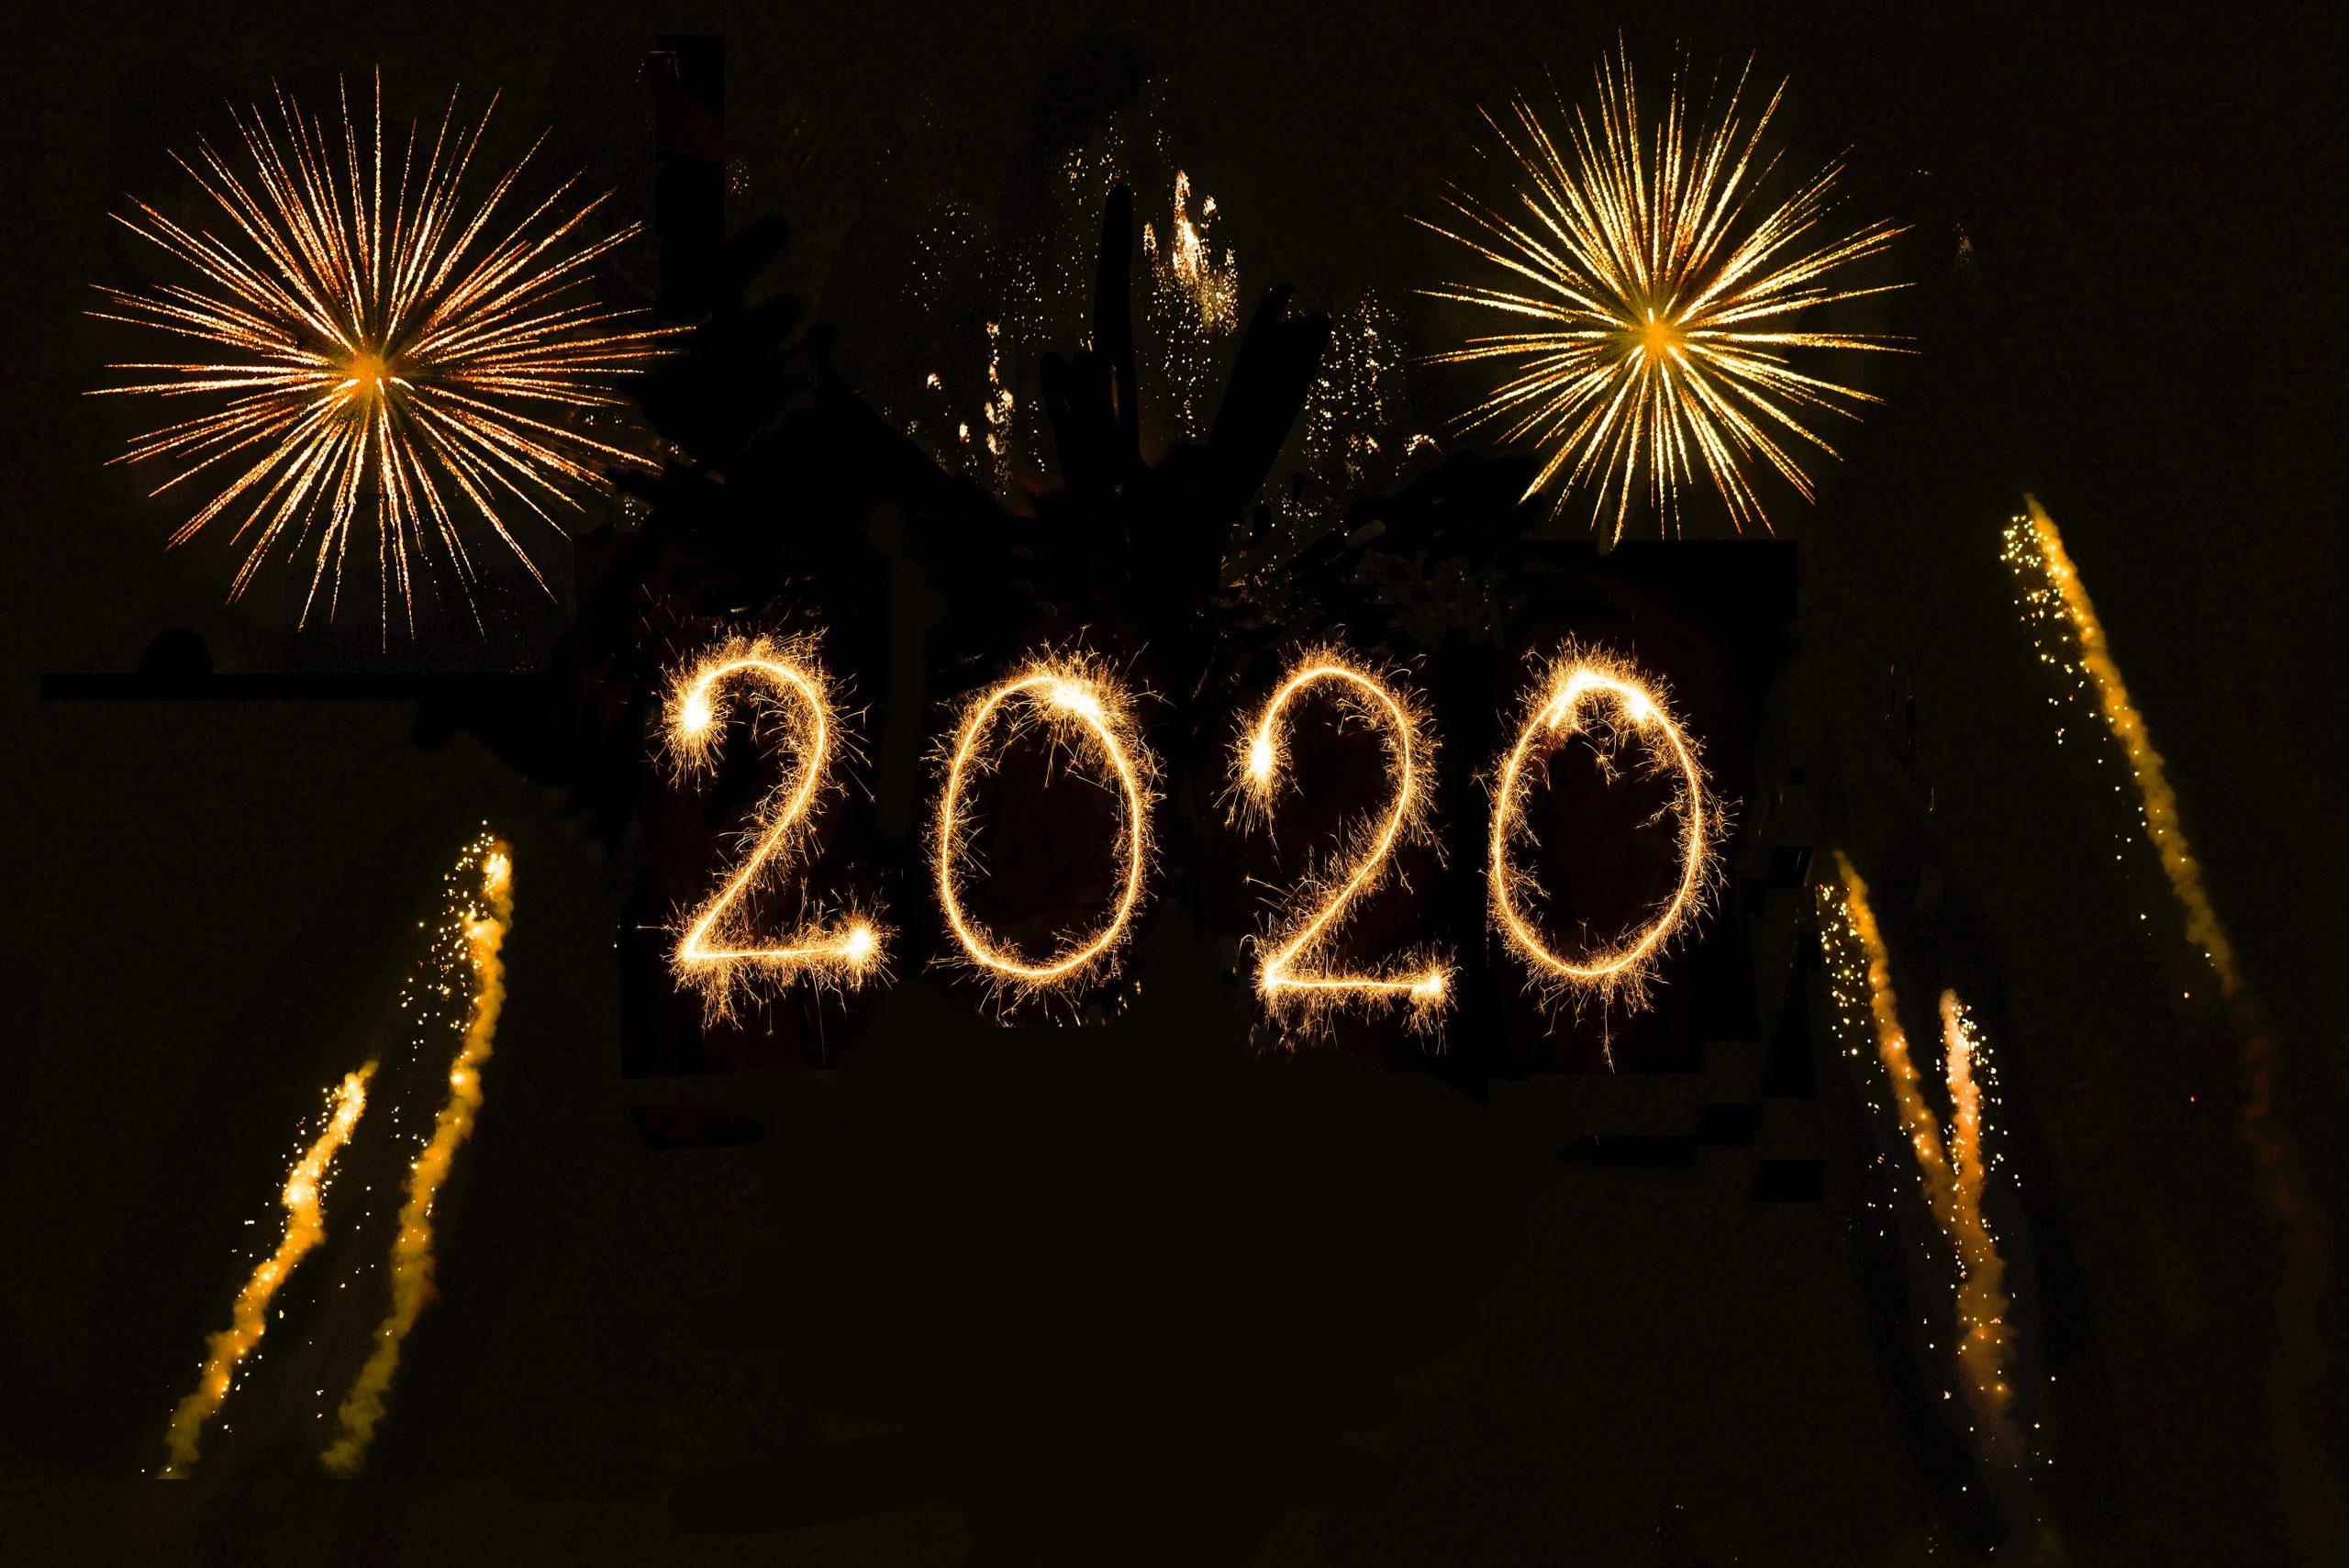 10 Ways To Begin Your Self Improvement Journey In 2020